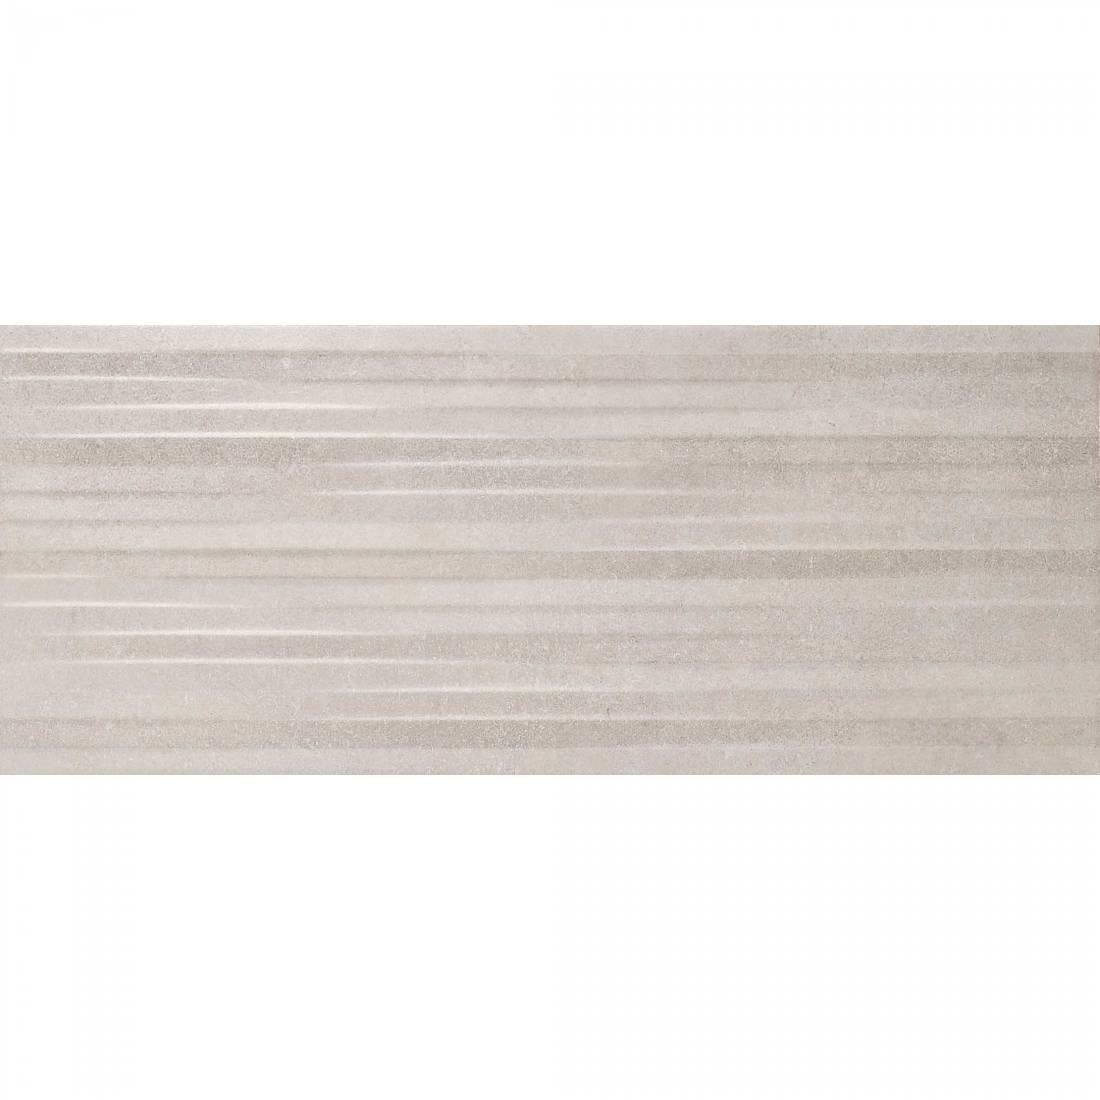 Auckland Relieve 25x60 Grey 1